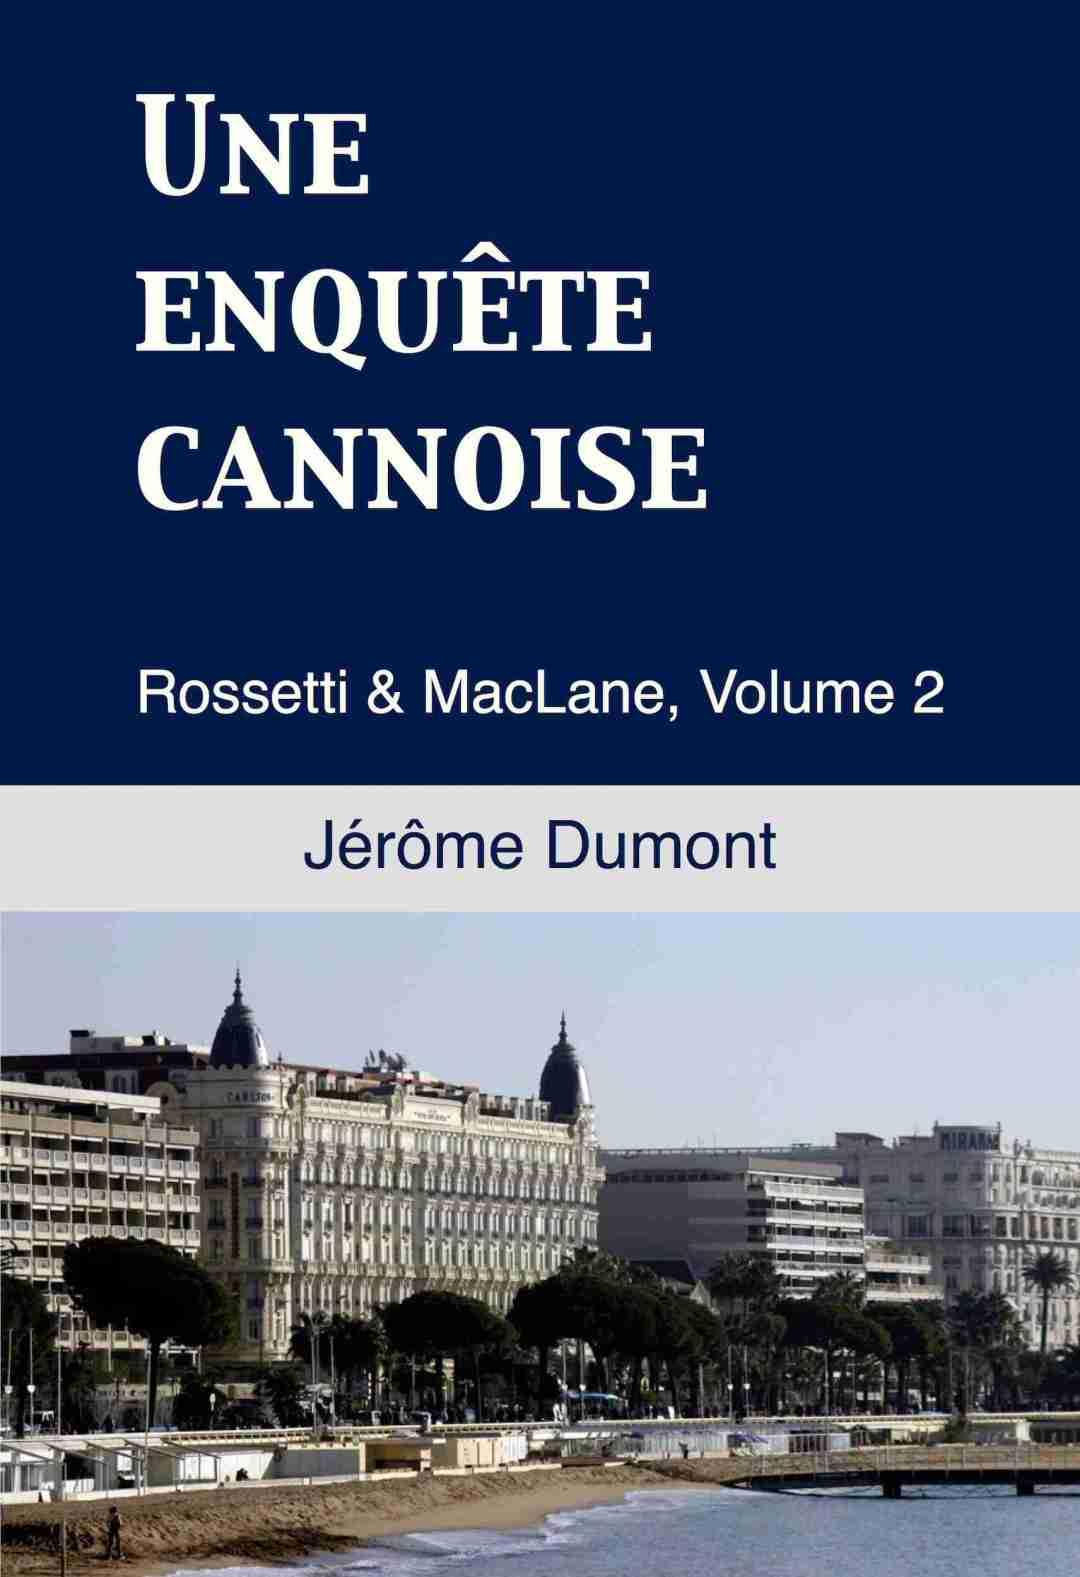 une-enquete-cannoise-rossetti-maclane-2